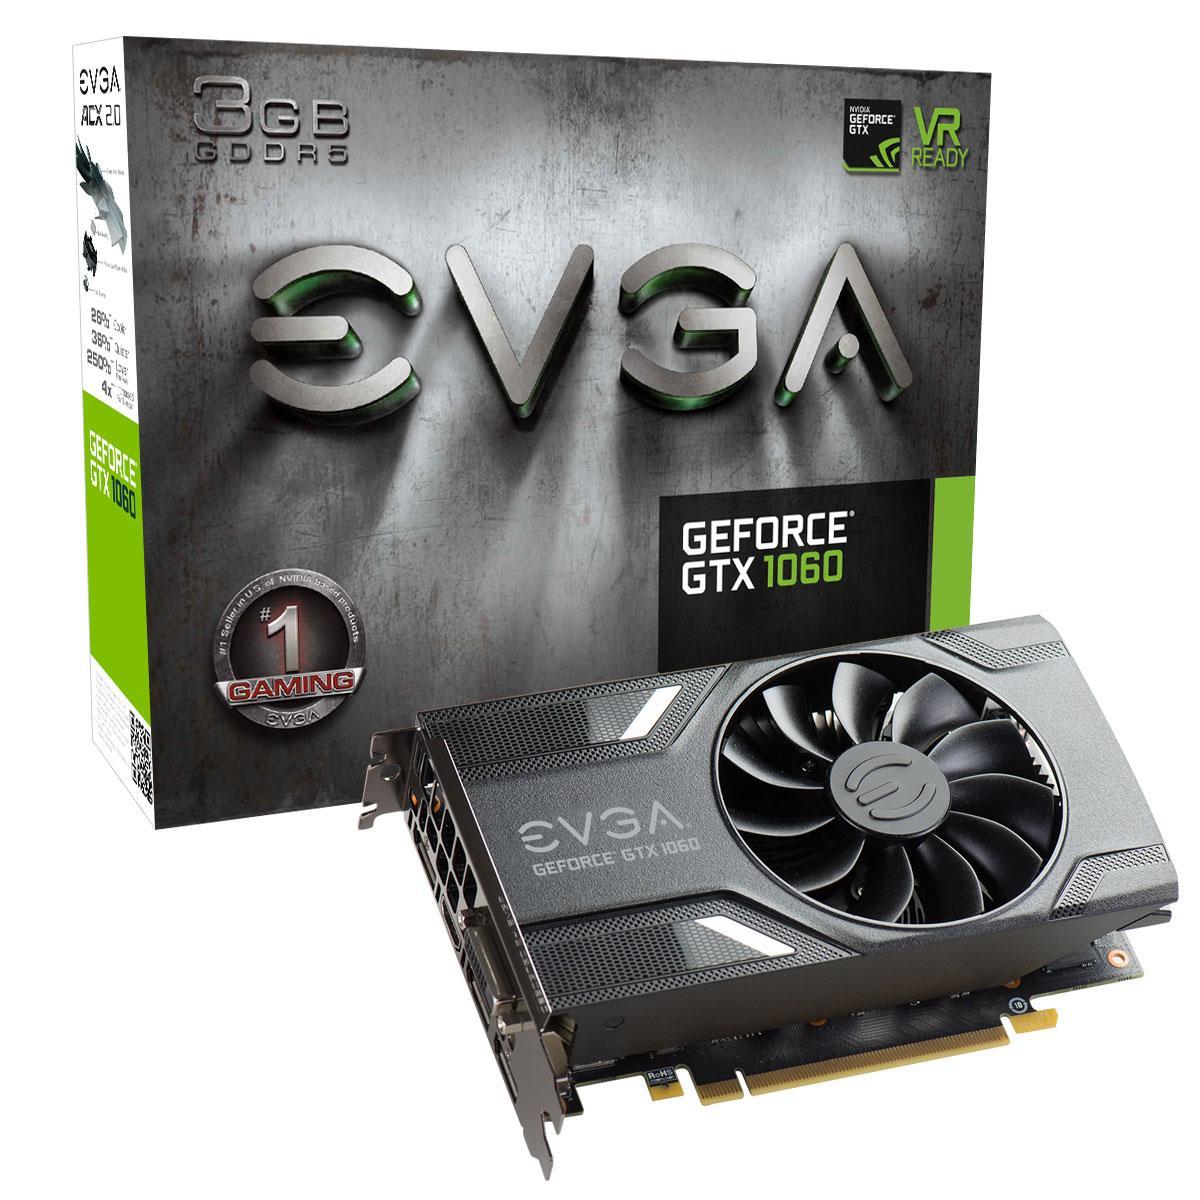 EVGA GeForce GTX 1060 3GB GeForce 1000 Series